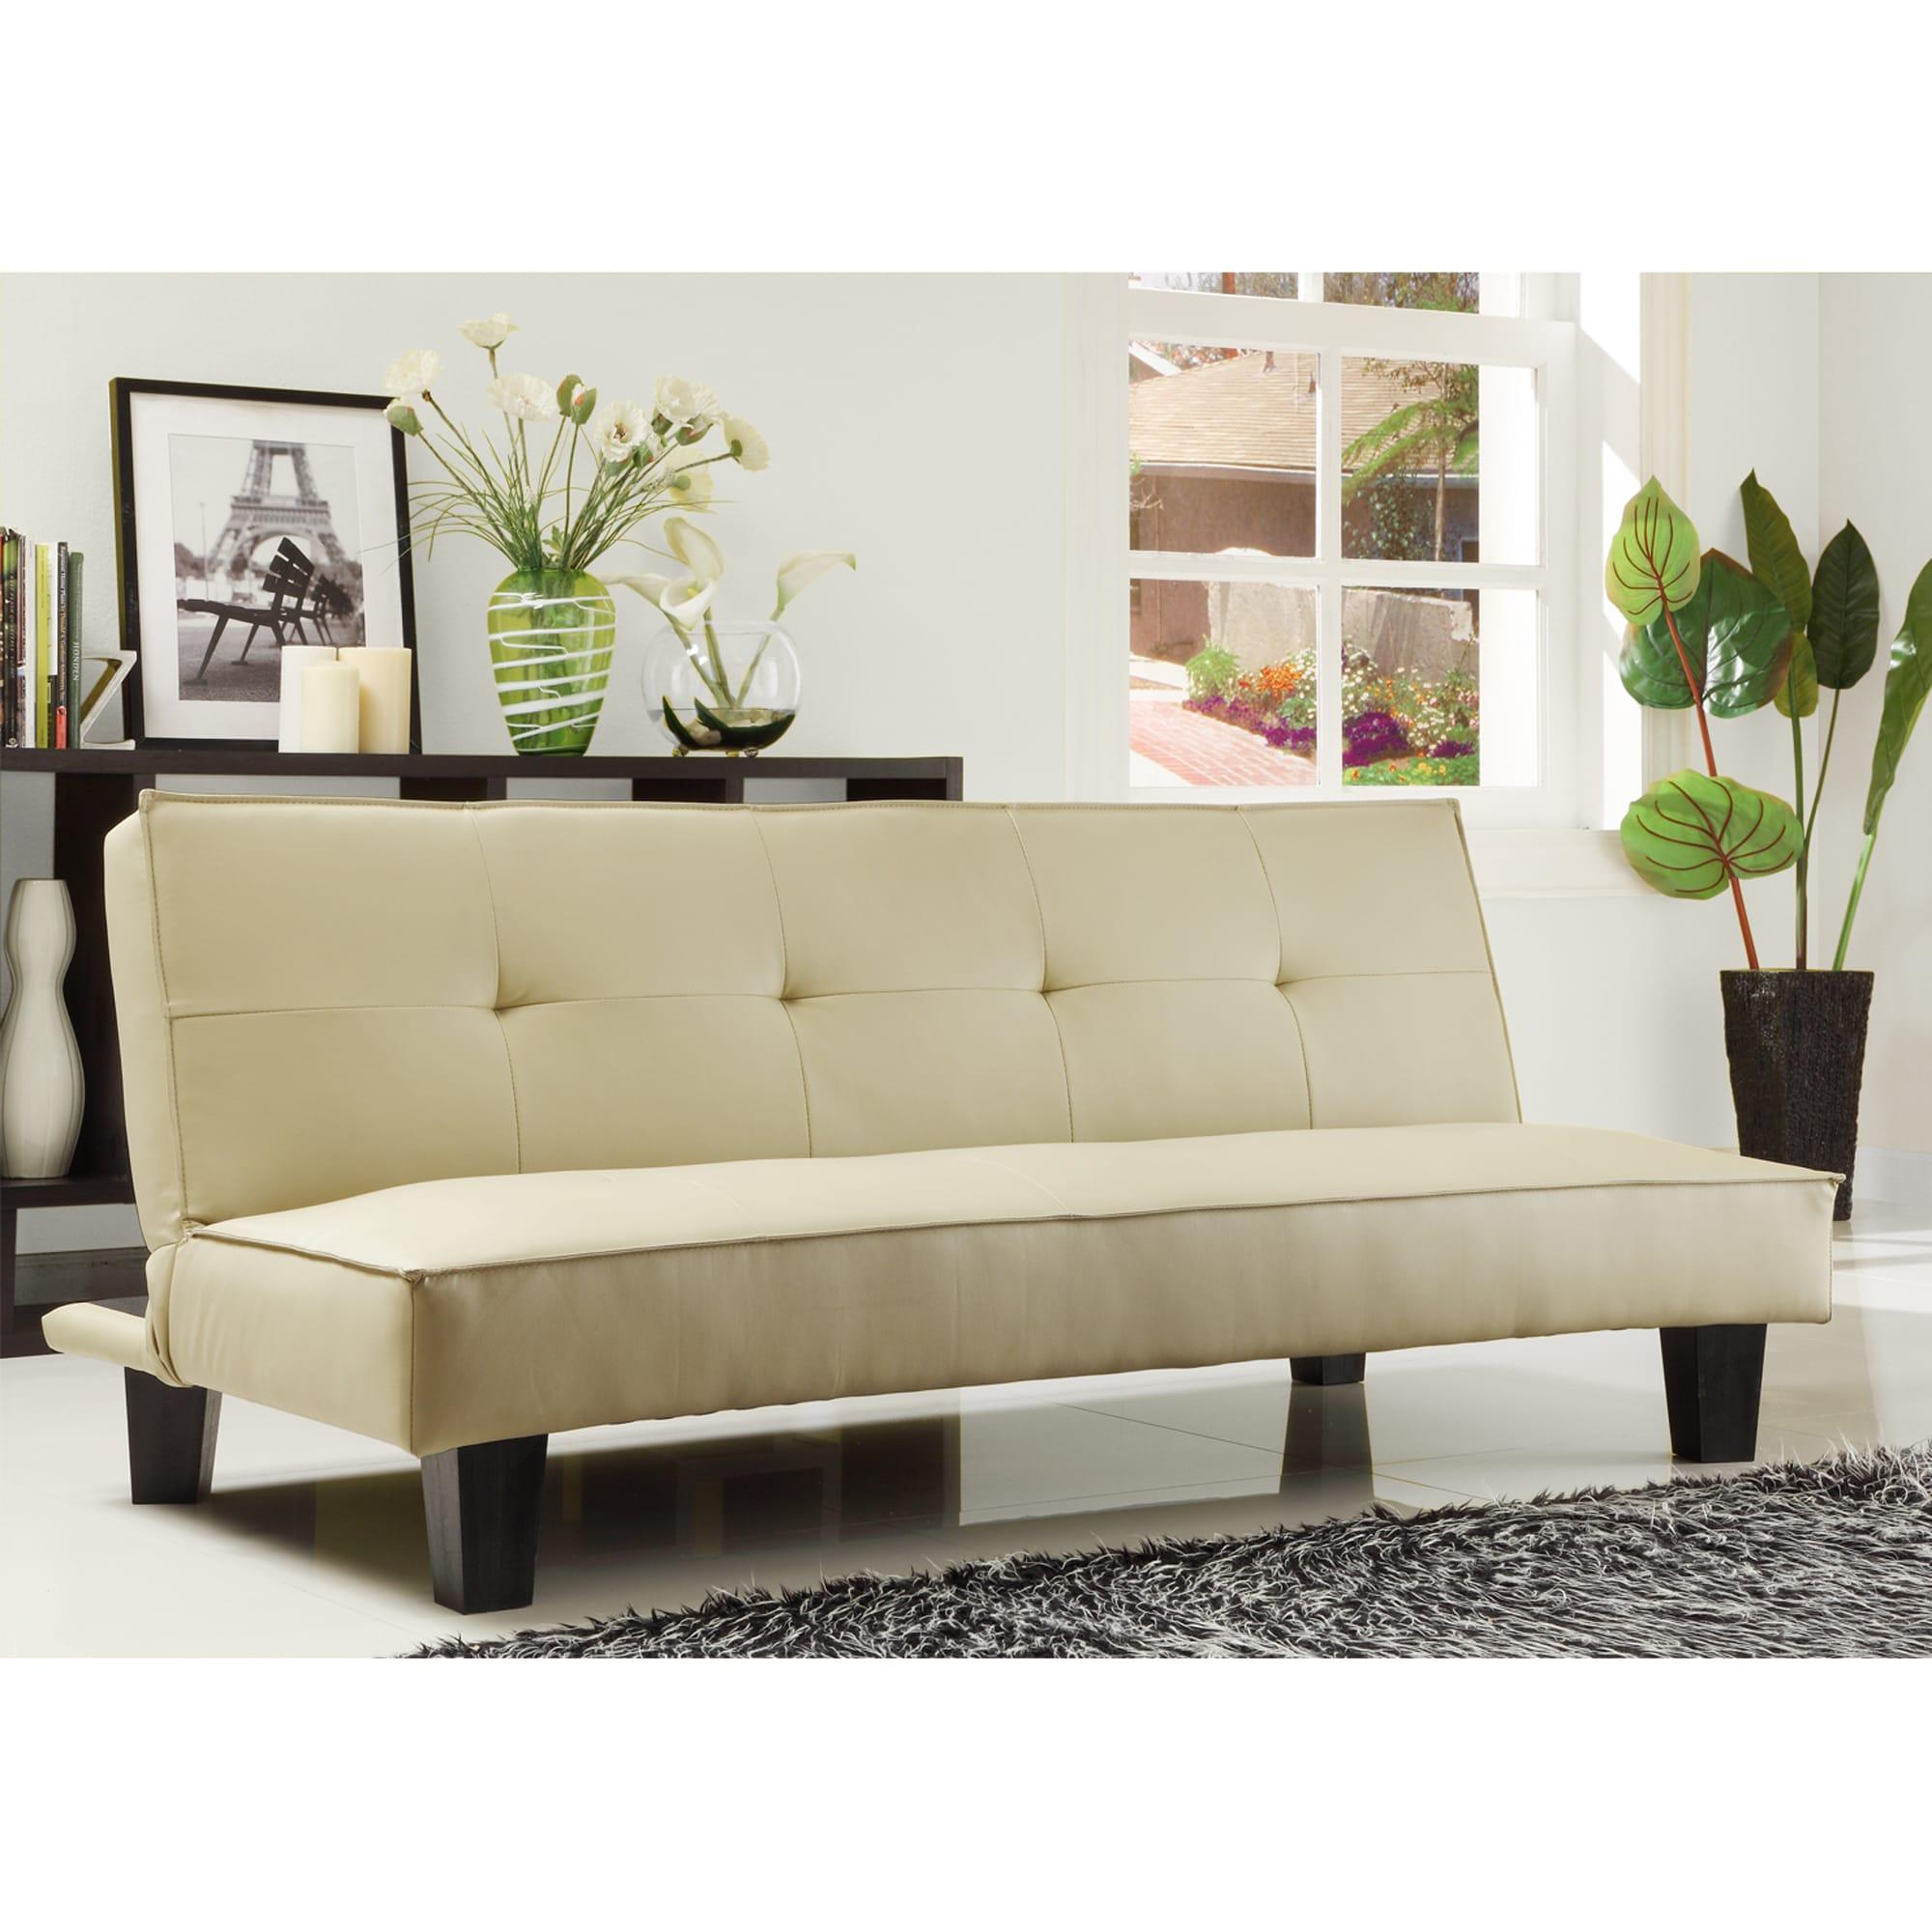 Bento Mini Futon Sofa Bed iNSPIRE Q Modern